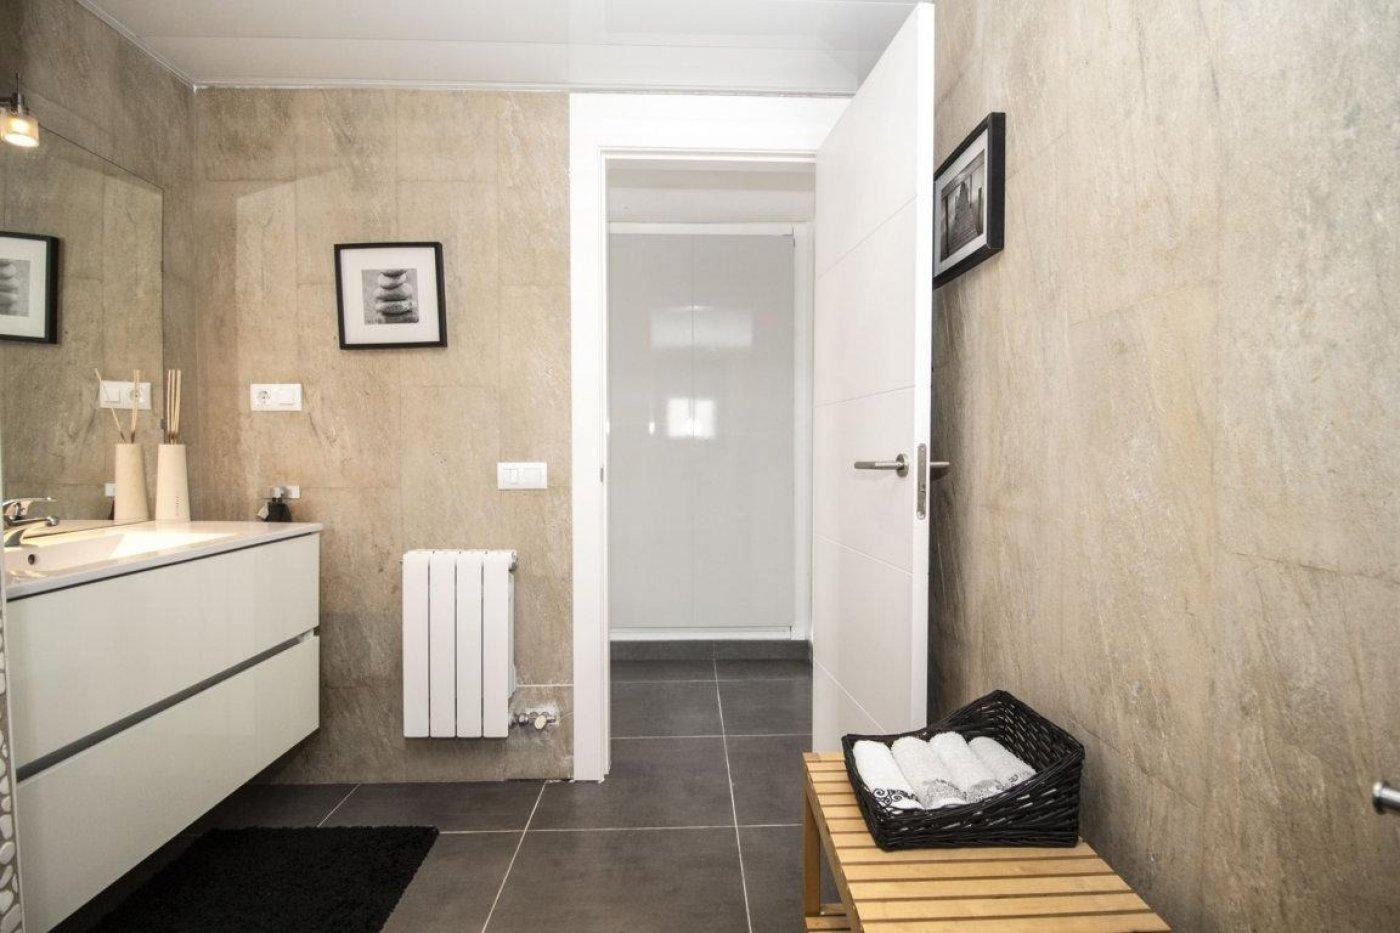 Casa exclusiva con piscina - imagenInmueble23